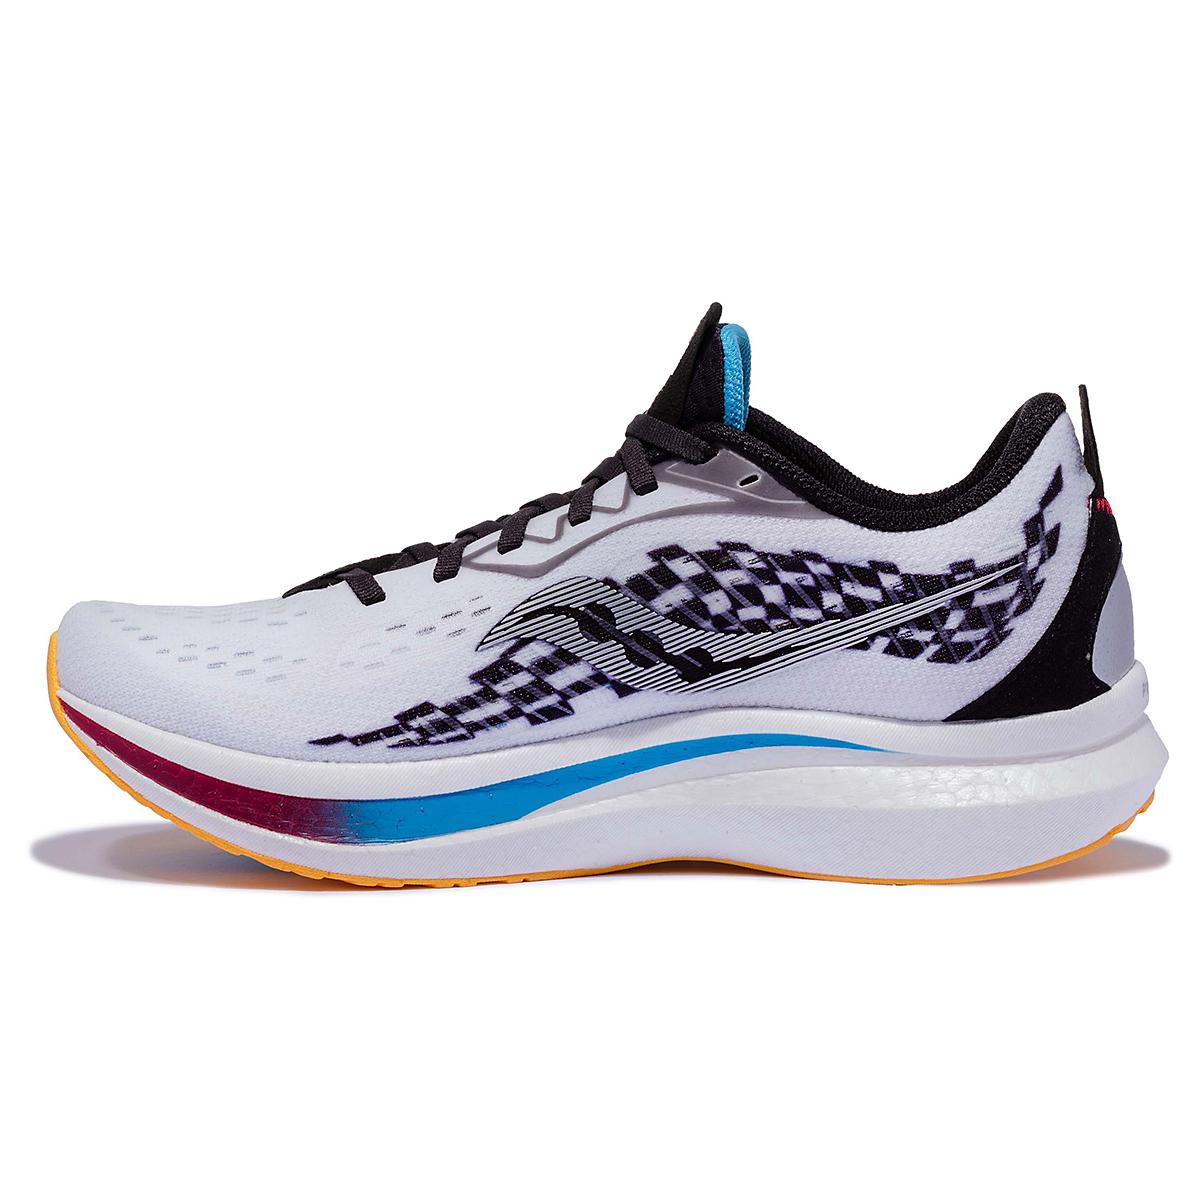 Men's Saucony Endorphin Speed 2 Running Shoe - Color: Reverie - Size: 7 - Width: Regular, Reverie, large, image 2